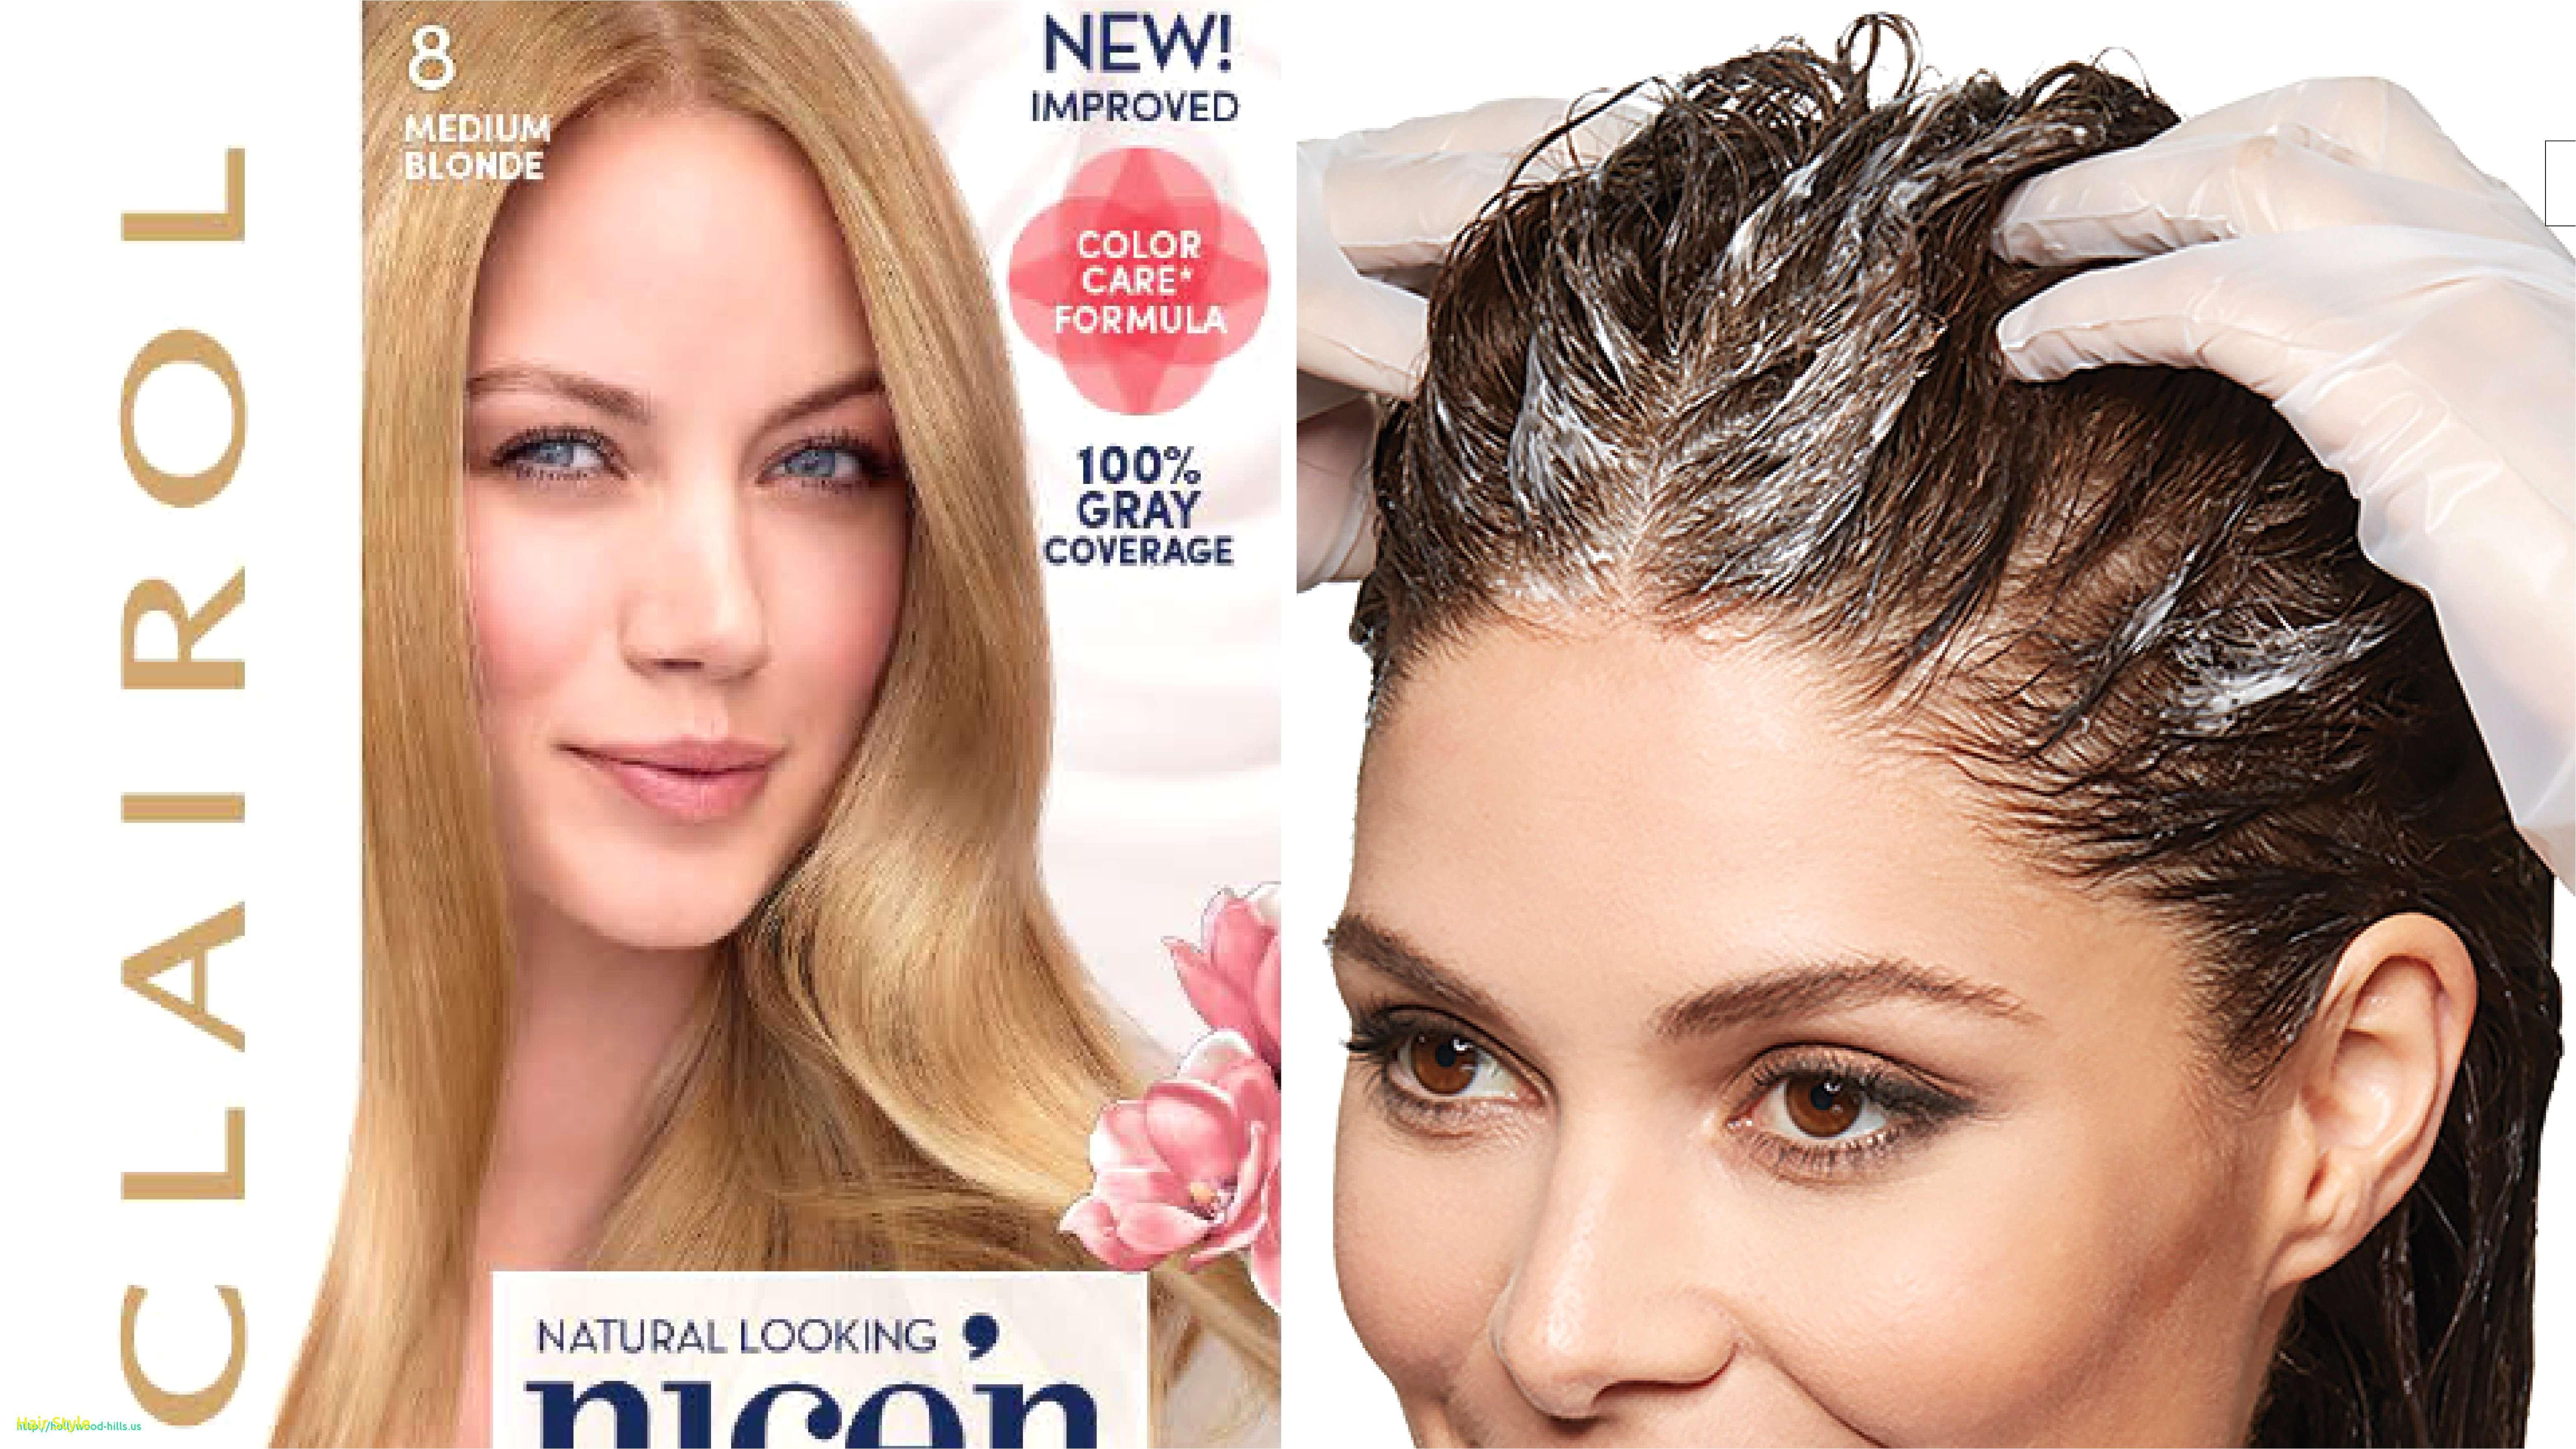 hair dye styles beautiful i pinimg 1200x 0d 60 8a 0d608a58a4bb3ed3b as well straight hair types cute hairstyles but easy